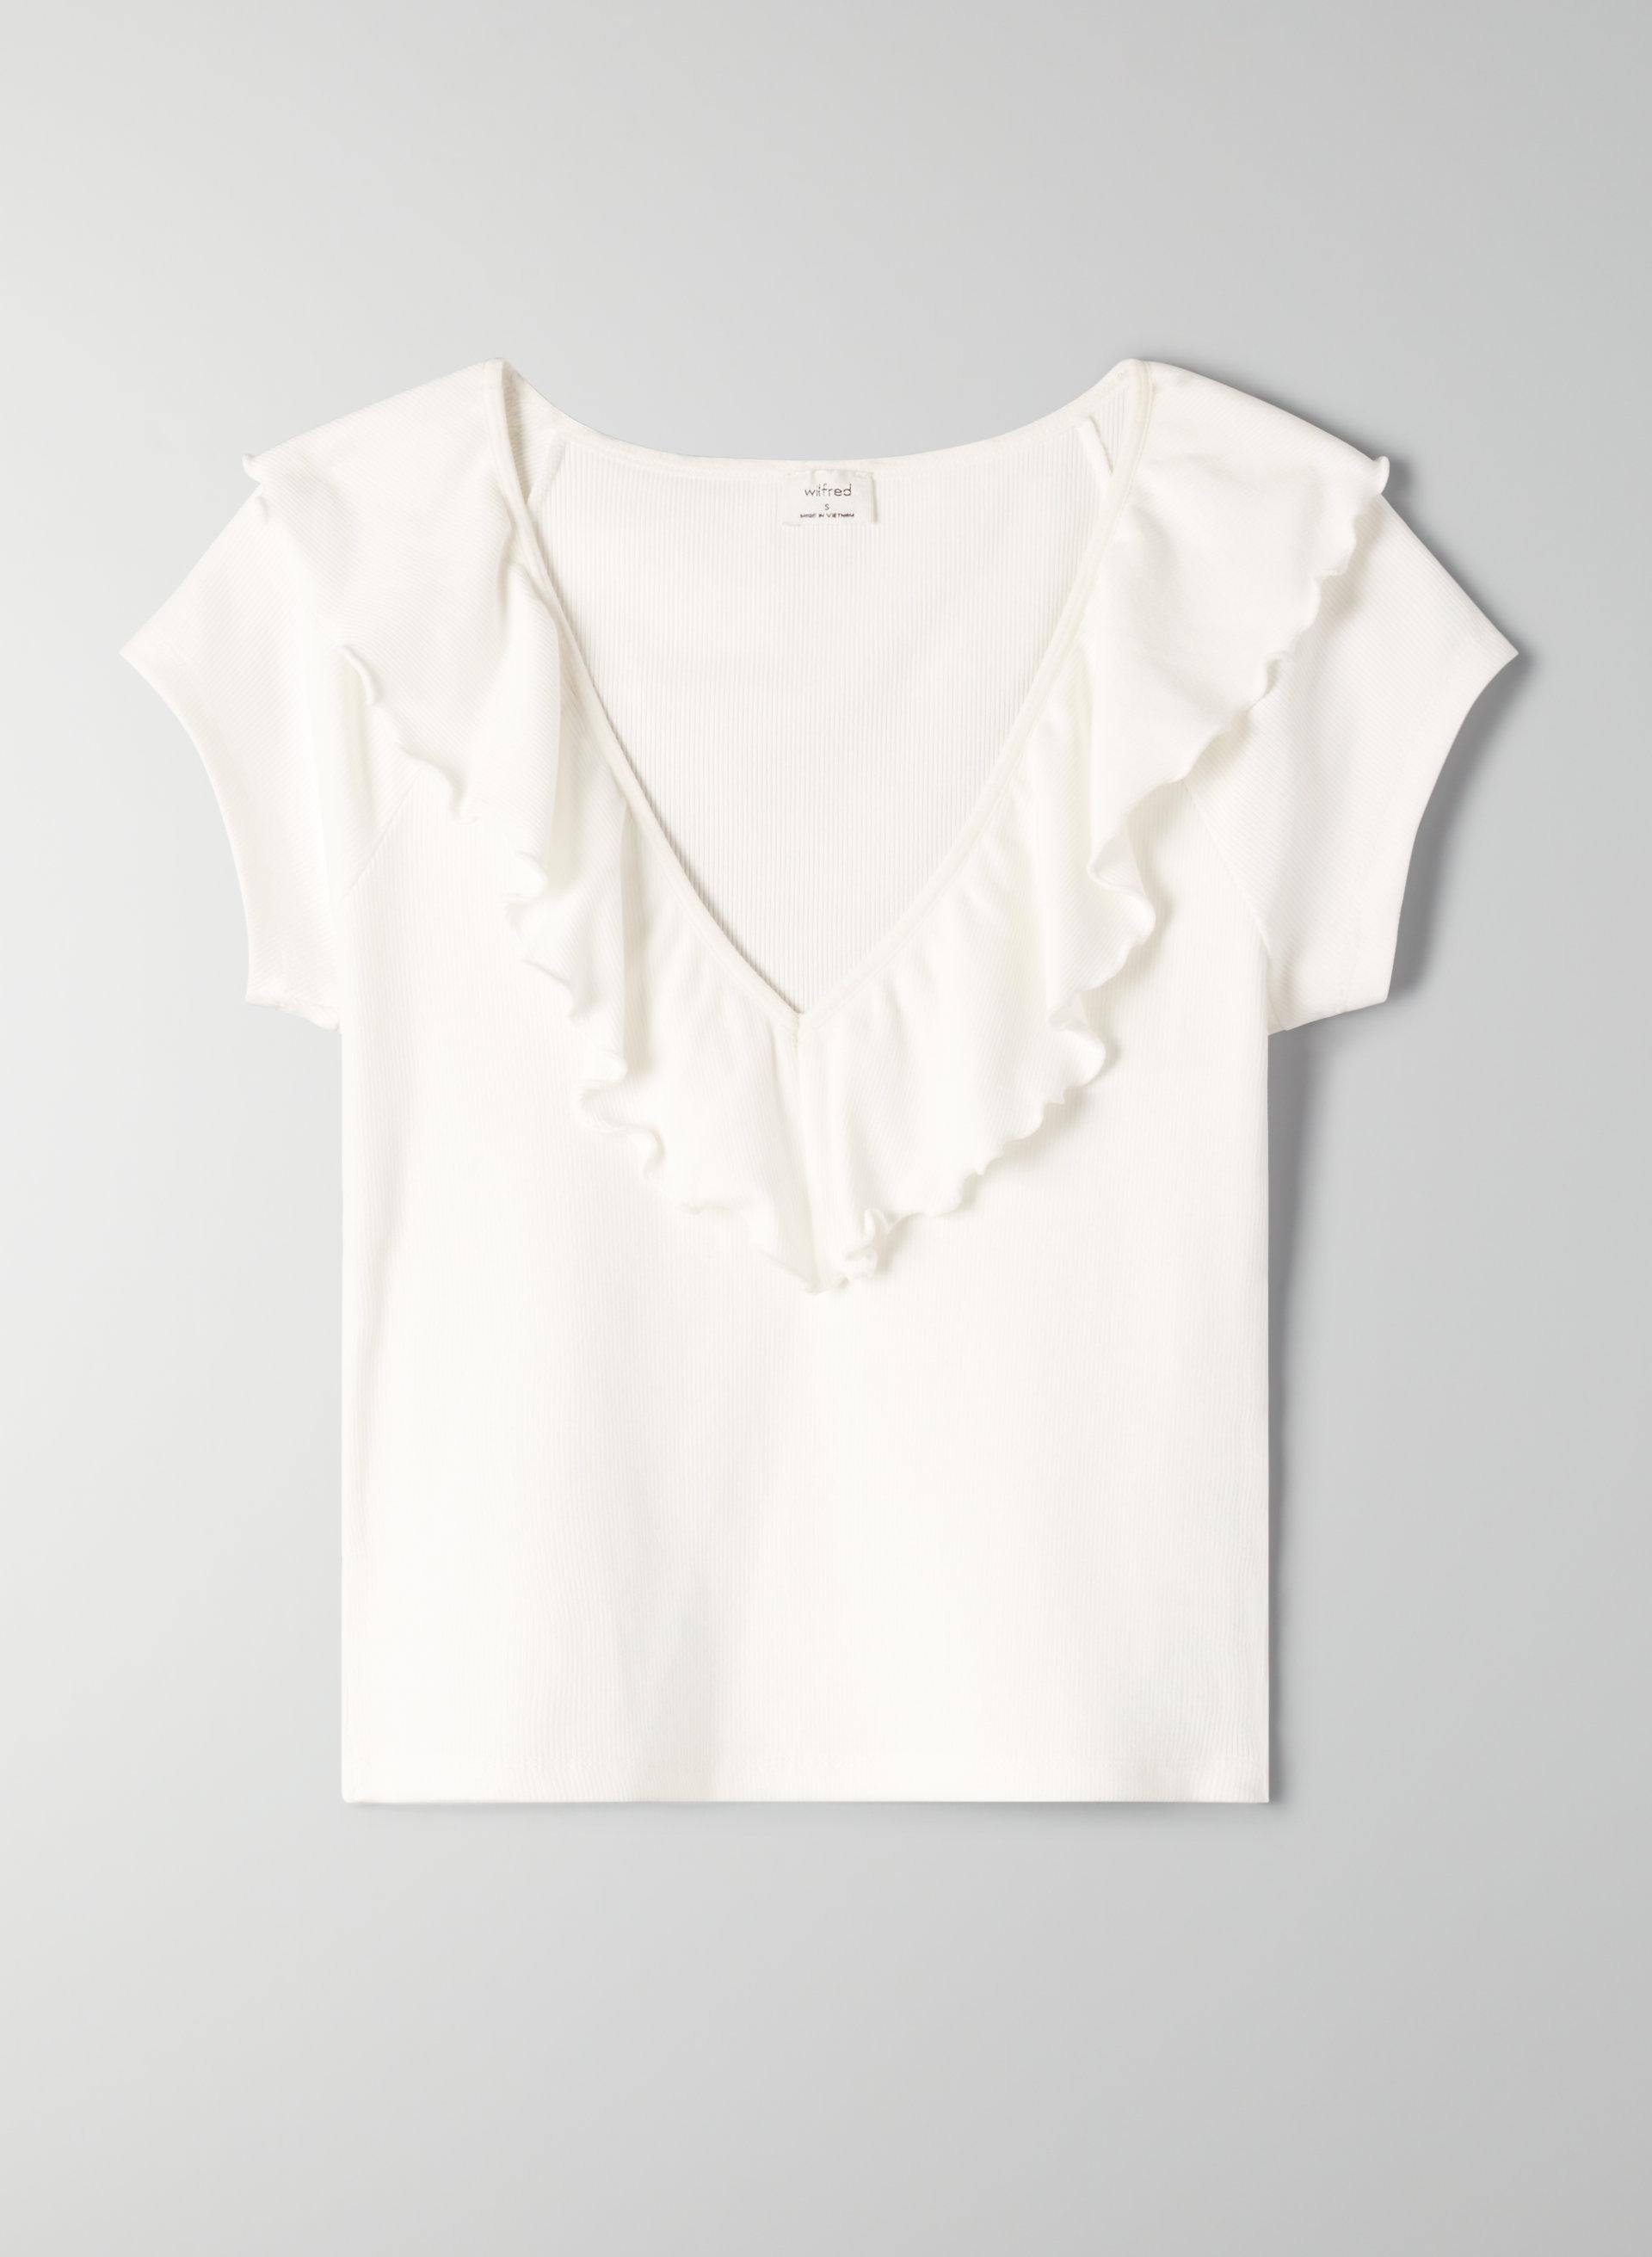 3efefcf97eb DANETTE T-SHIRT - Cropped, ruffled V-neck t-shirt